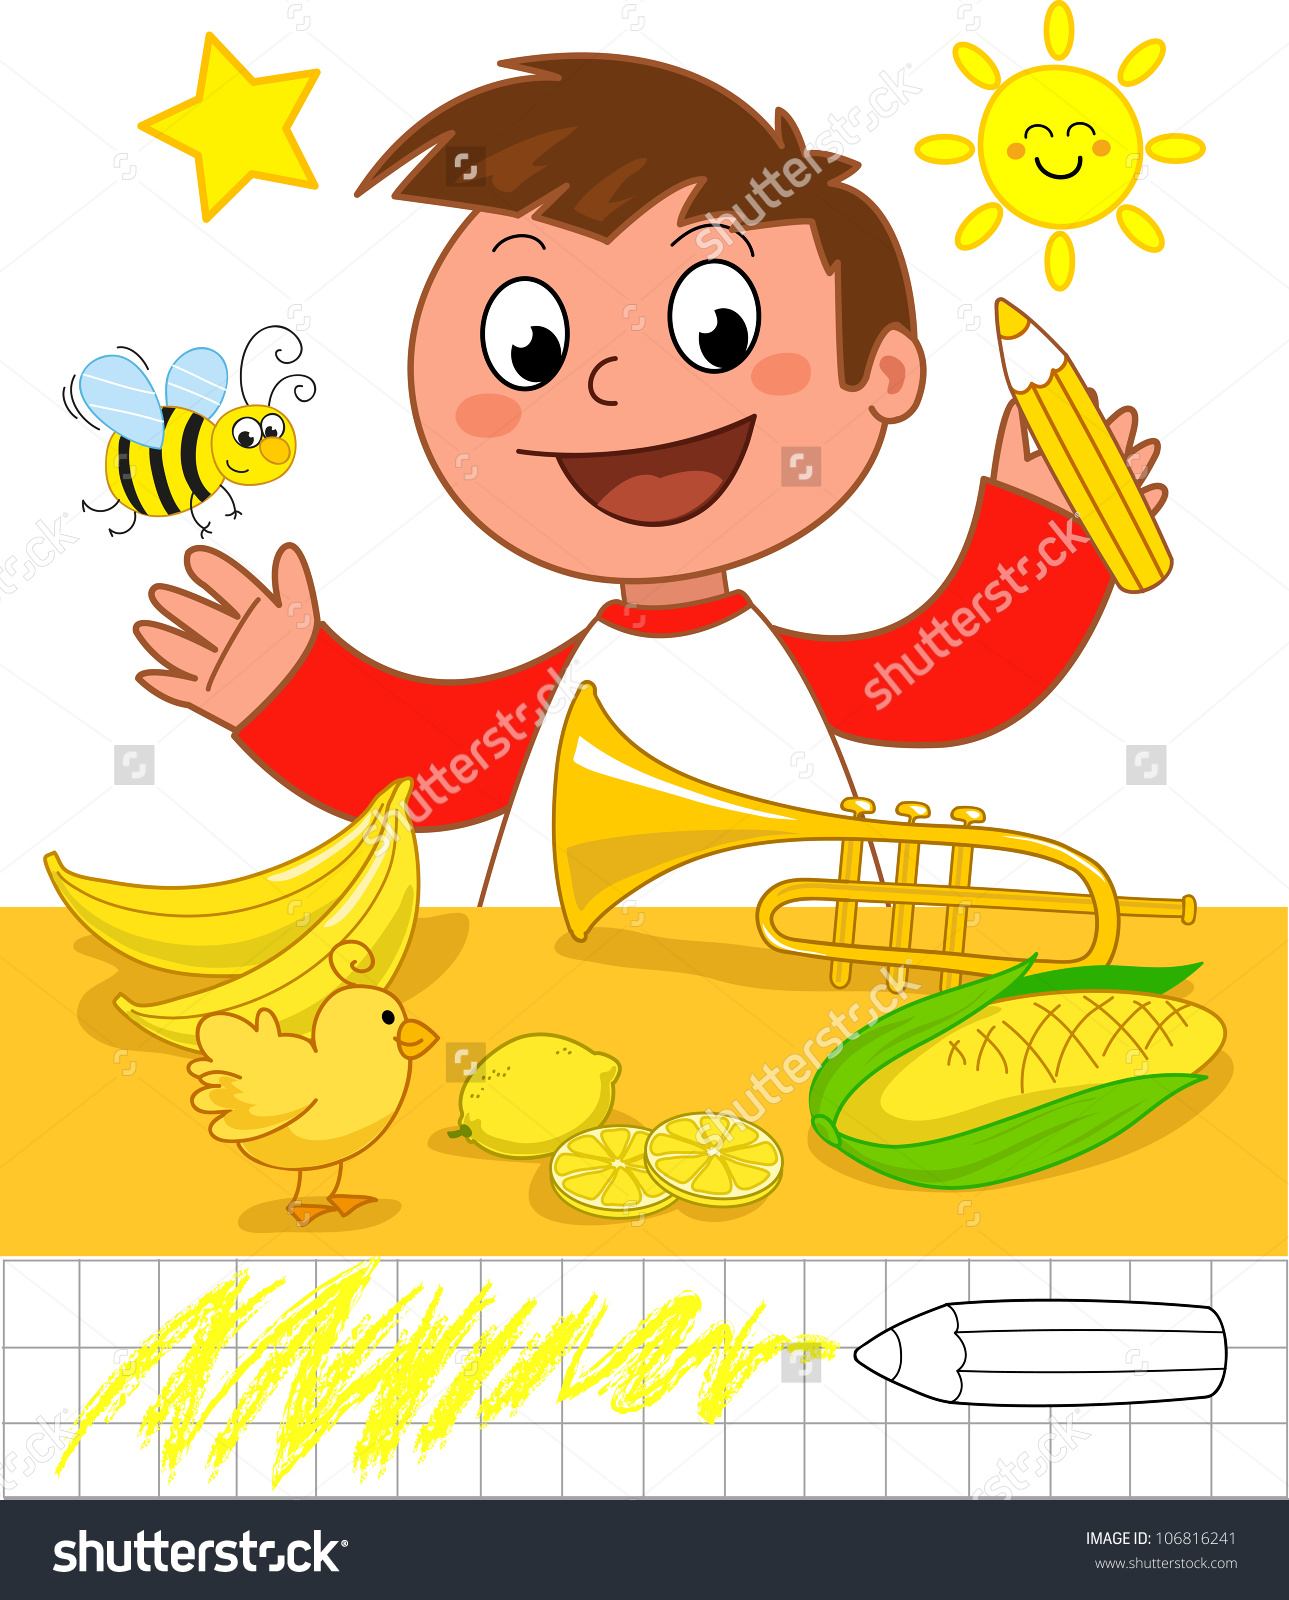 Cute Cartoon Boy Showing Yellow Objects Stock Vector 106816241.